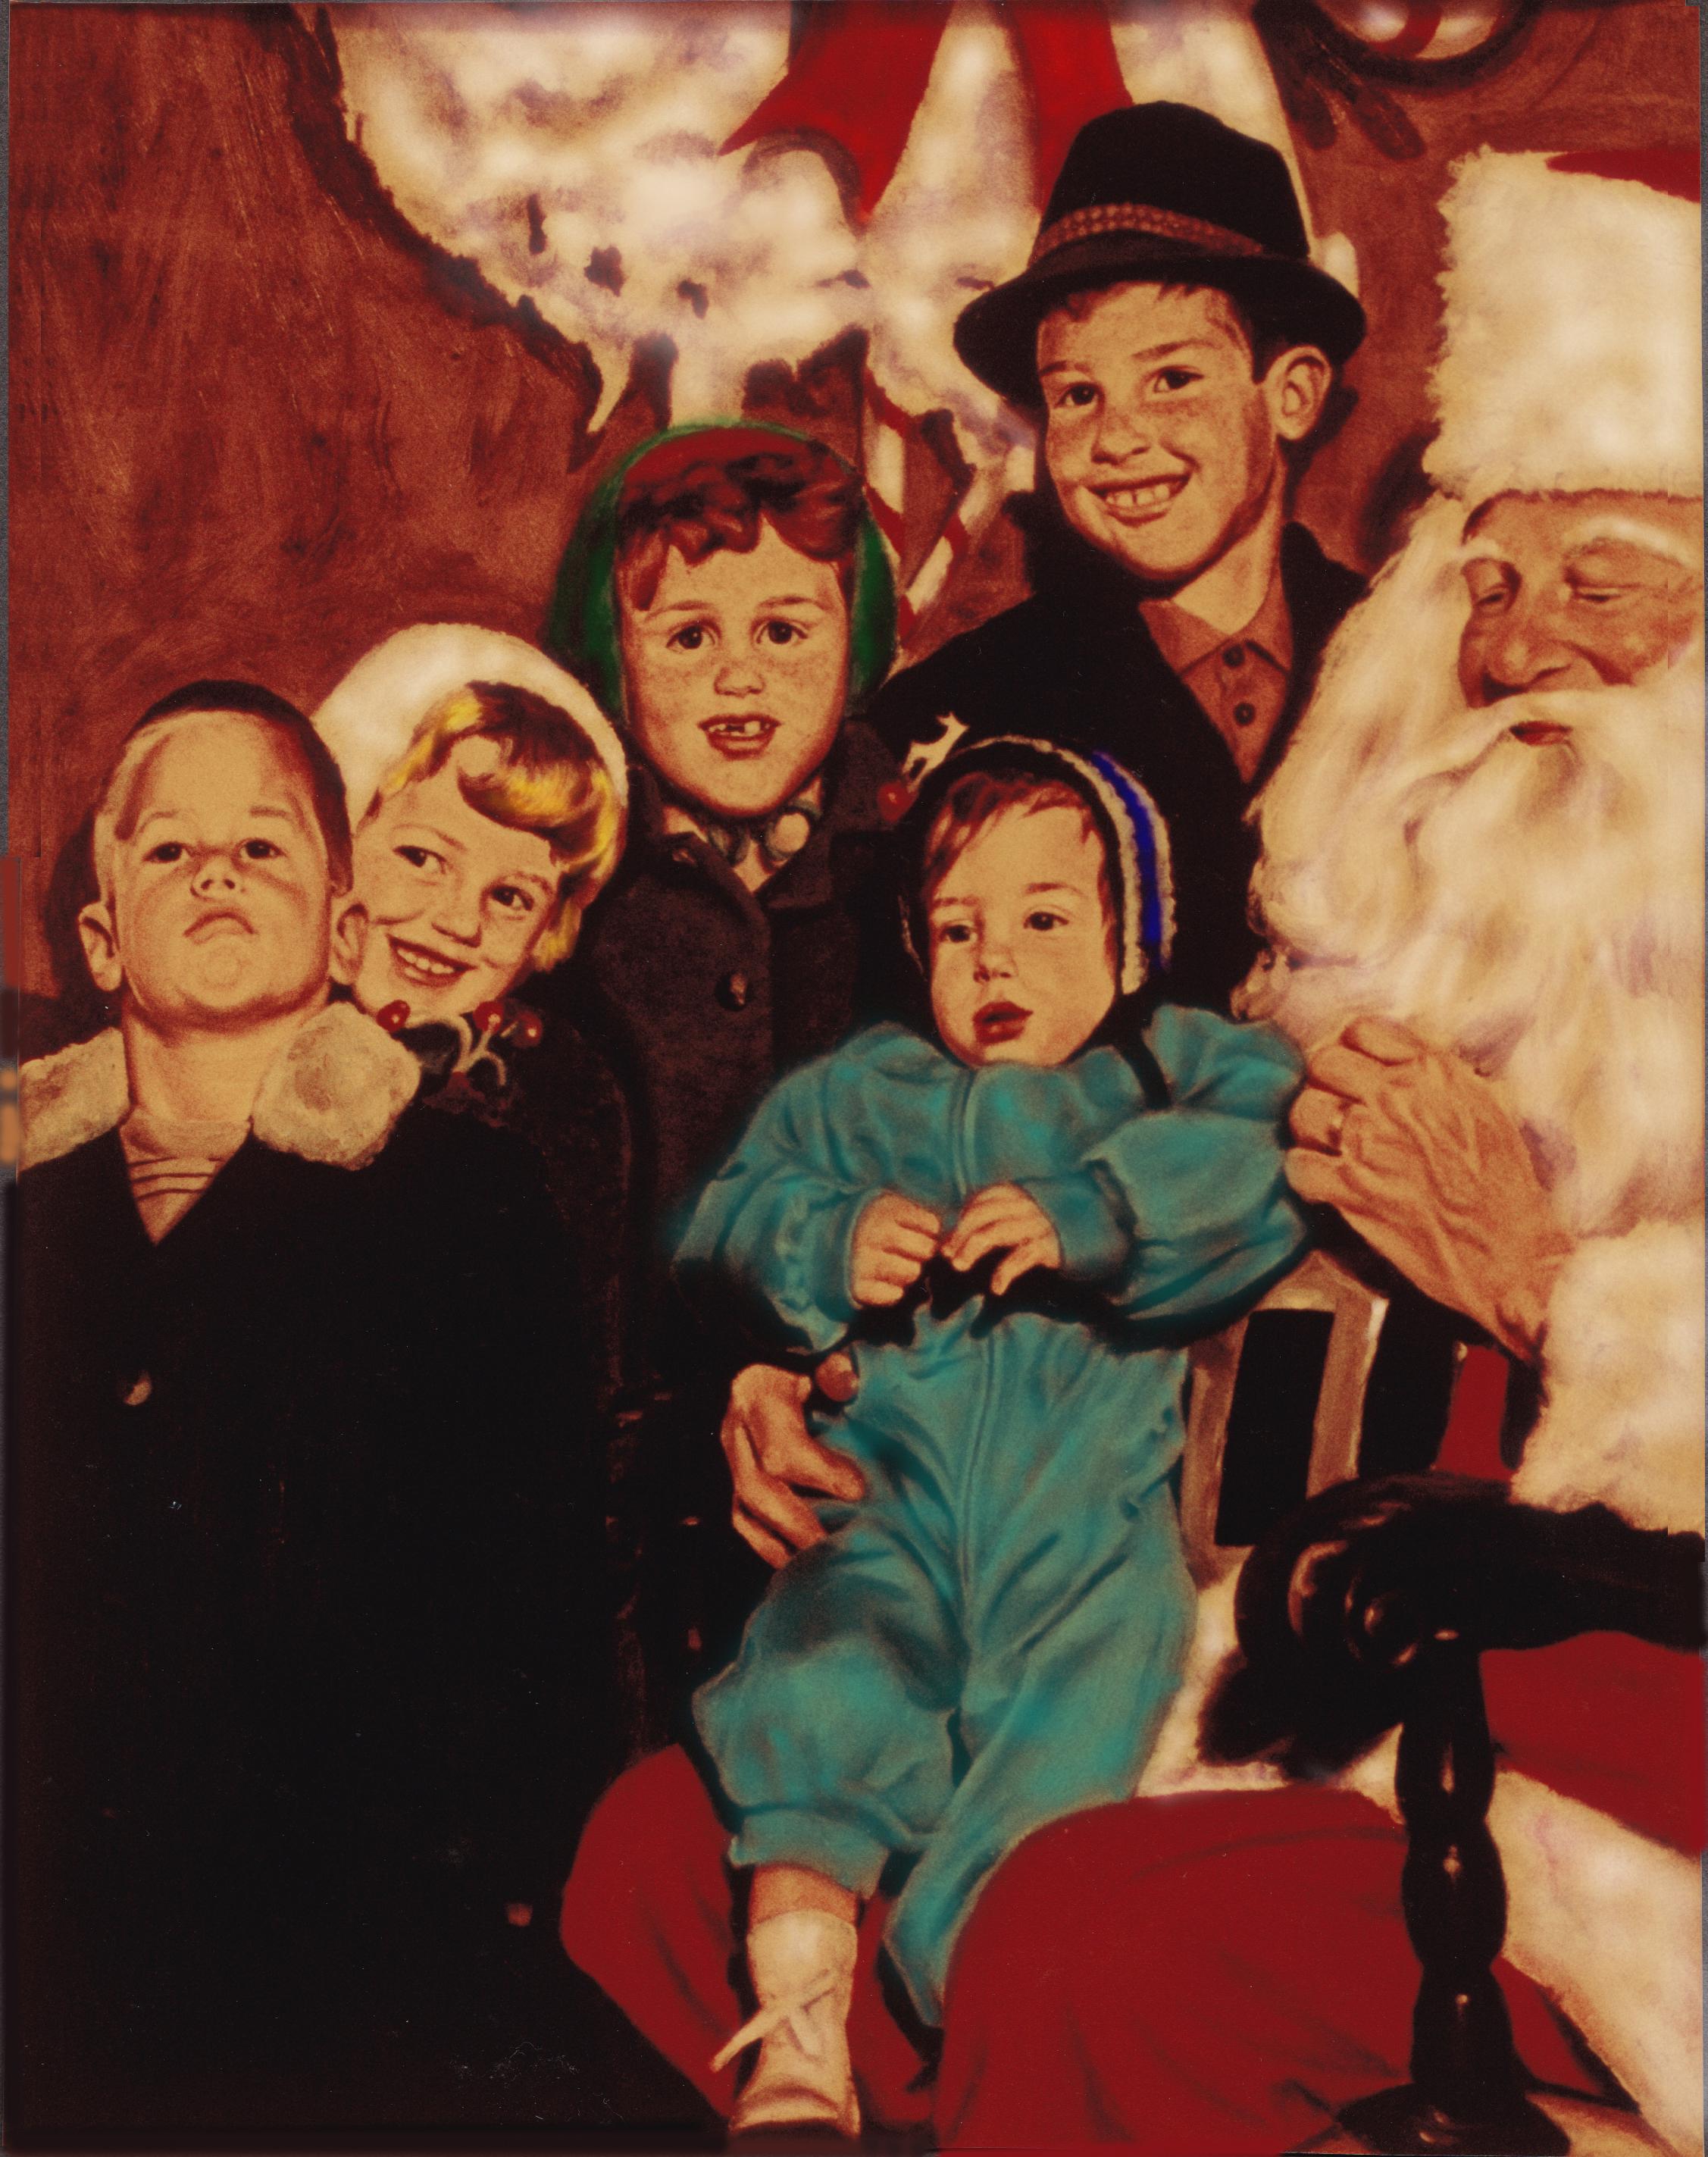 Sharkey+Christmas.jpg